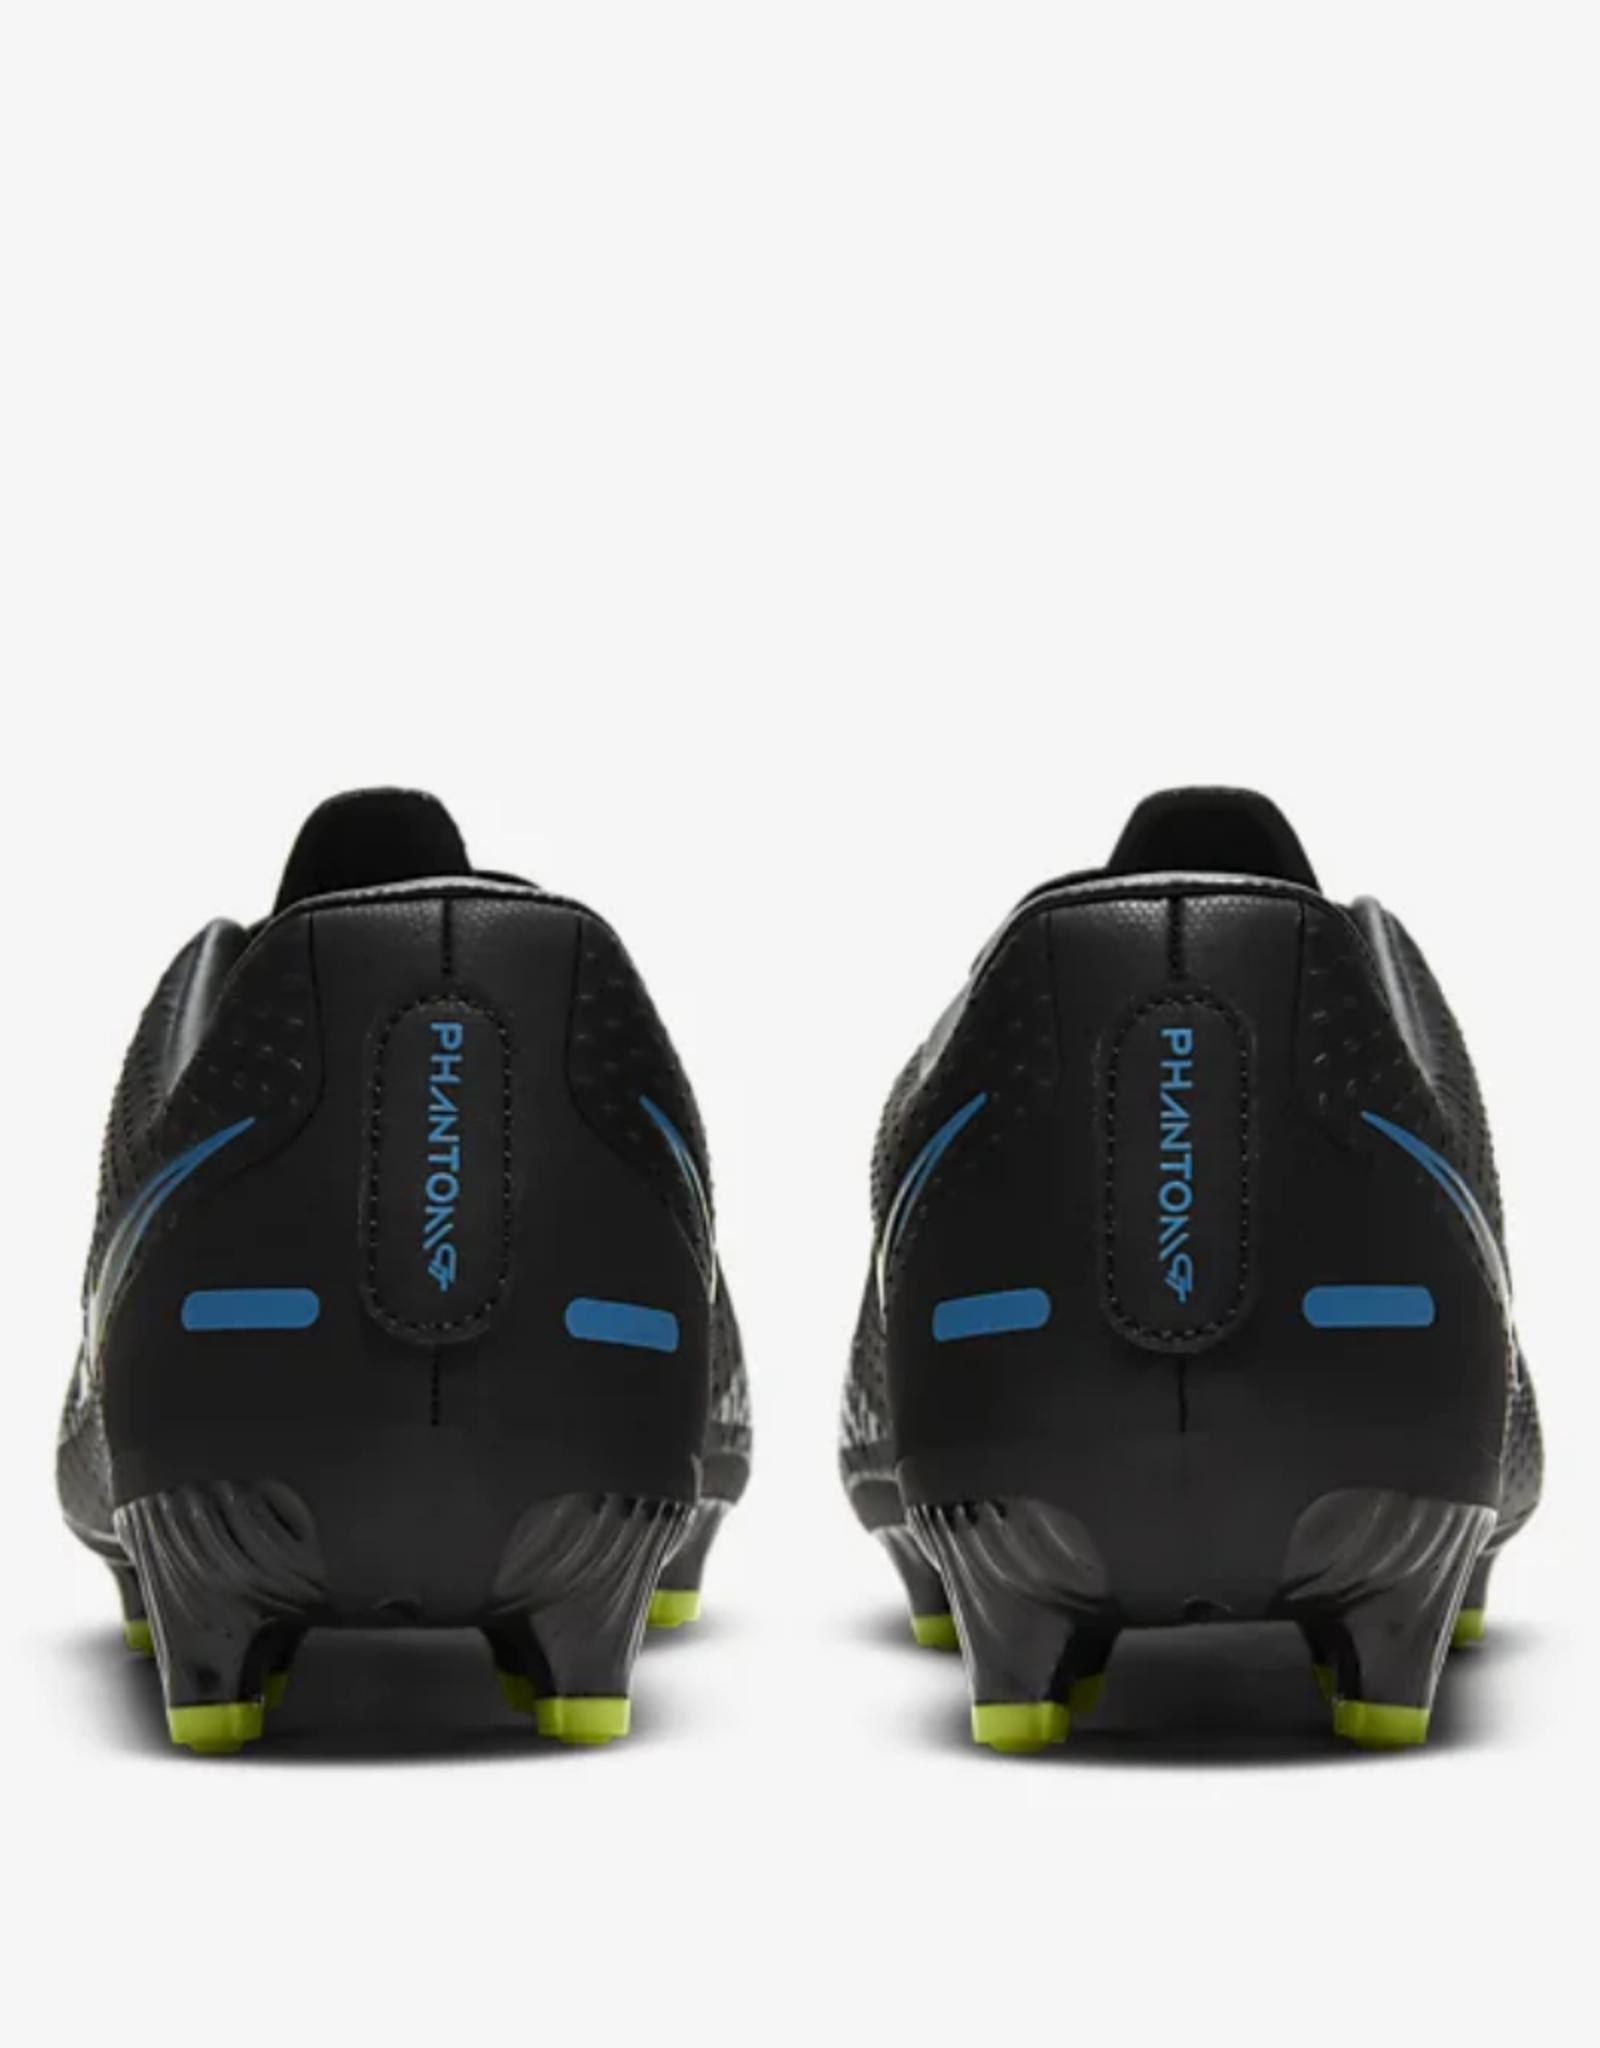 Nike Phantom GT Academy Soccer Cleat Black